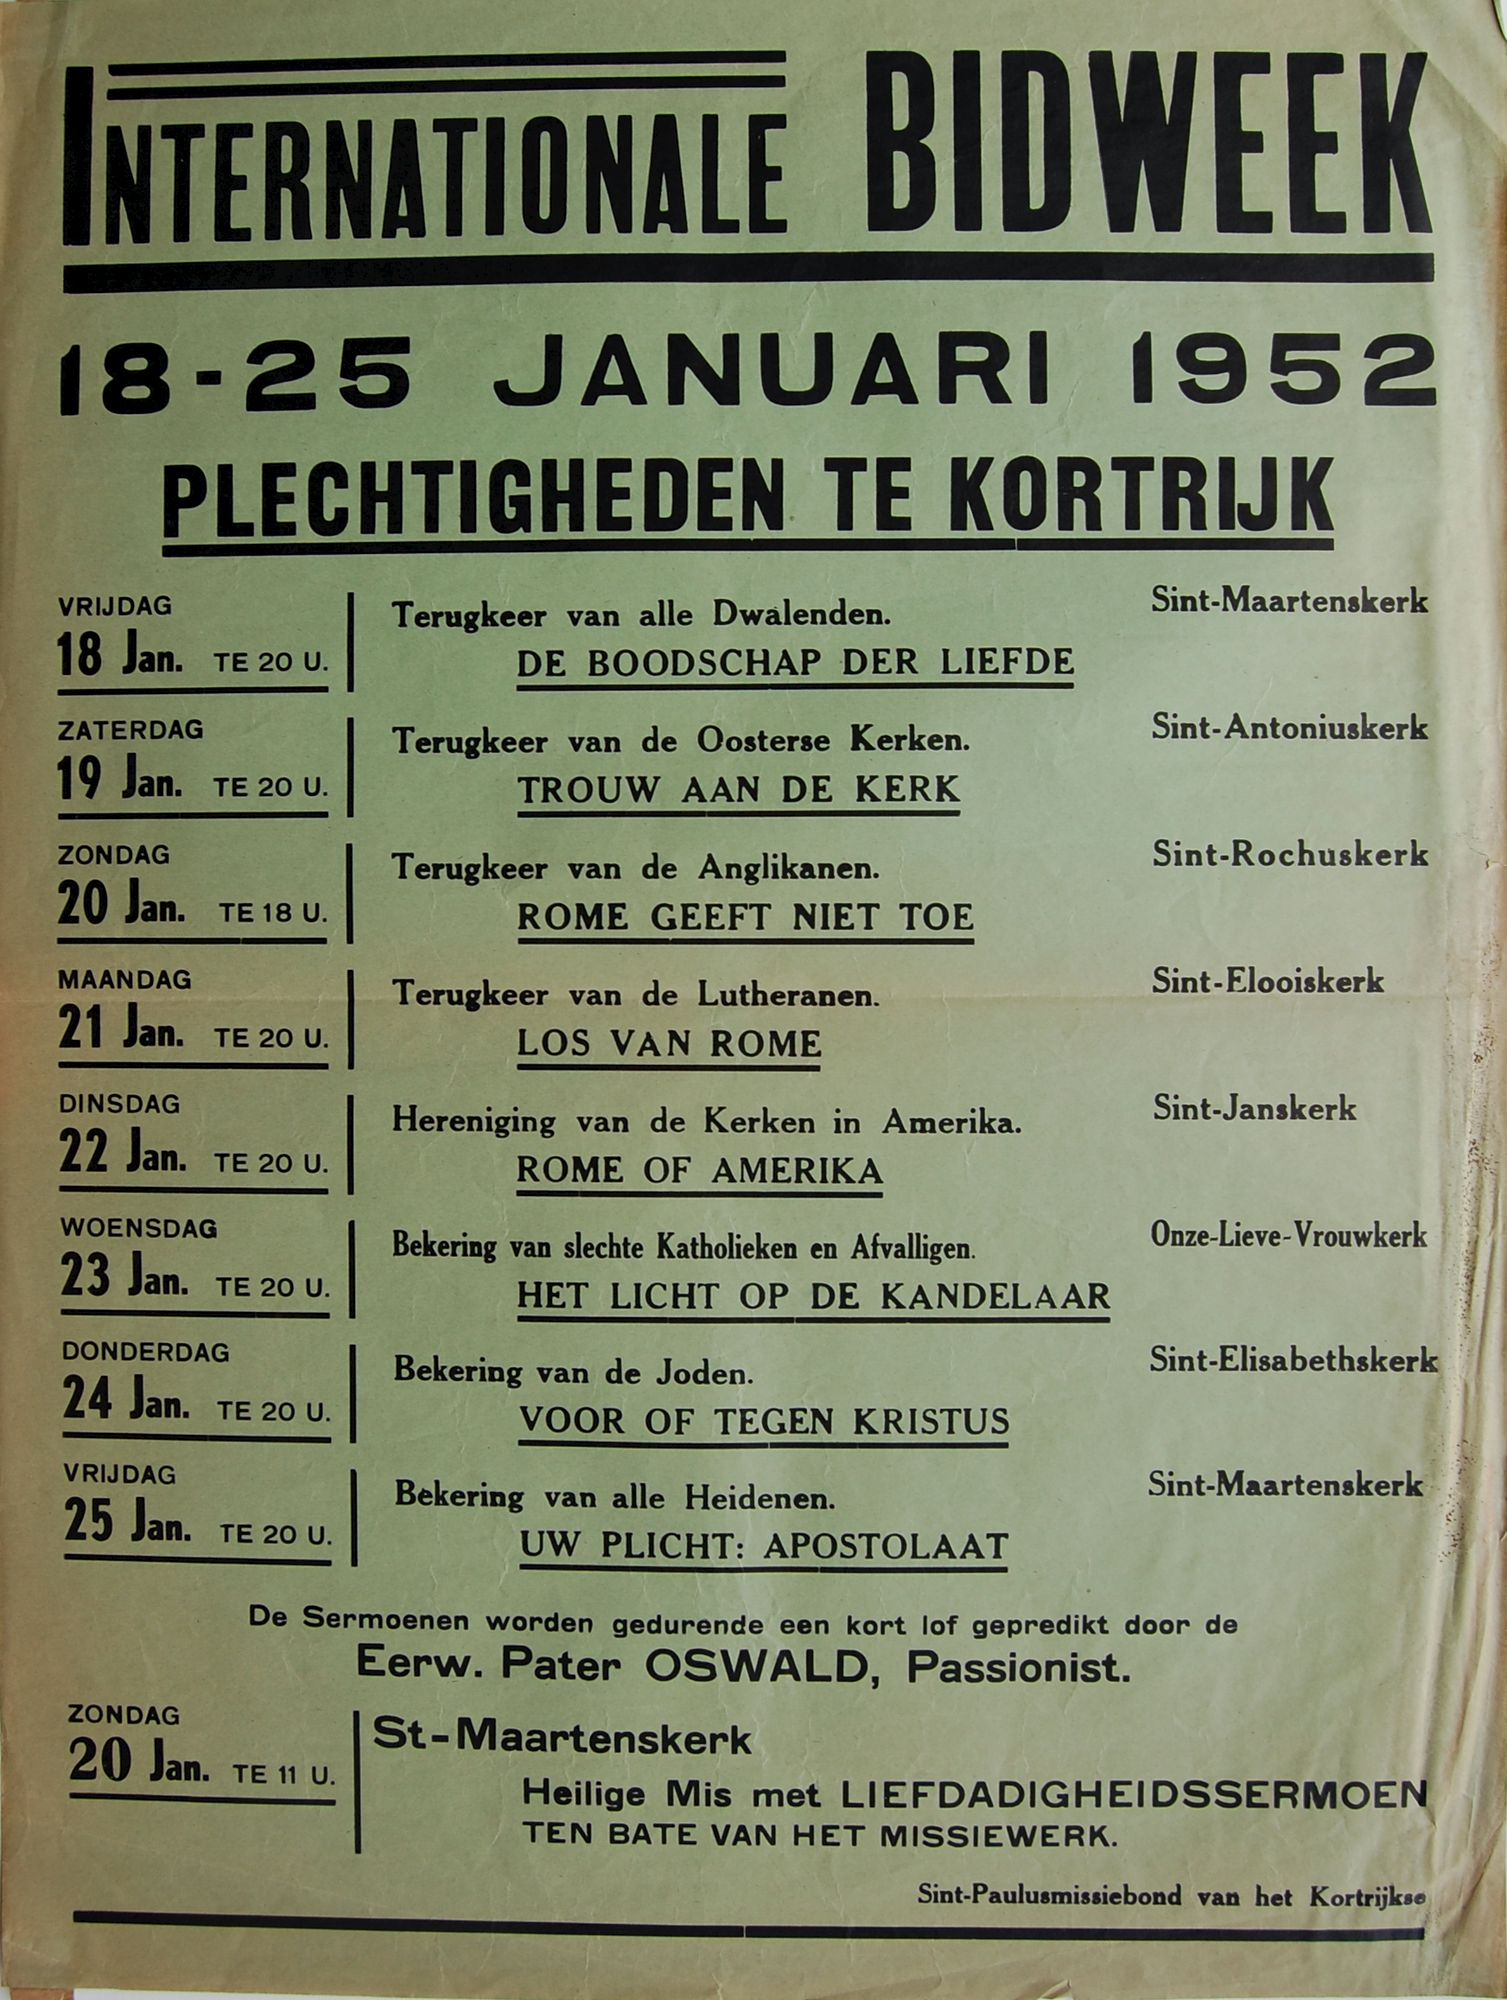 Bidweek 1952